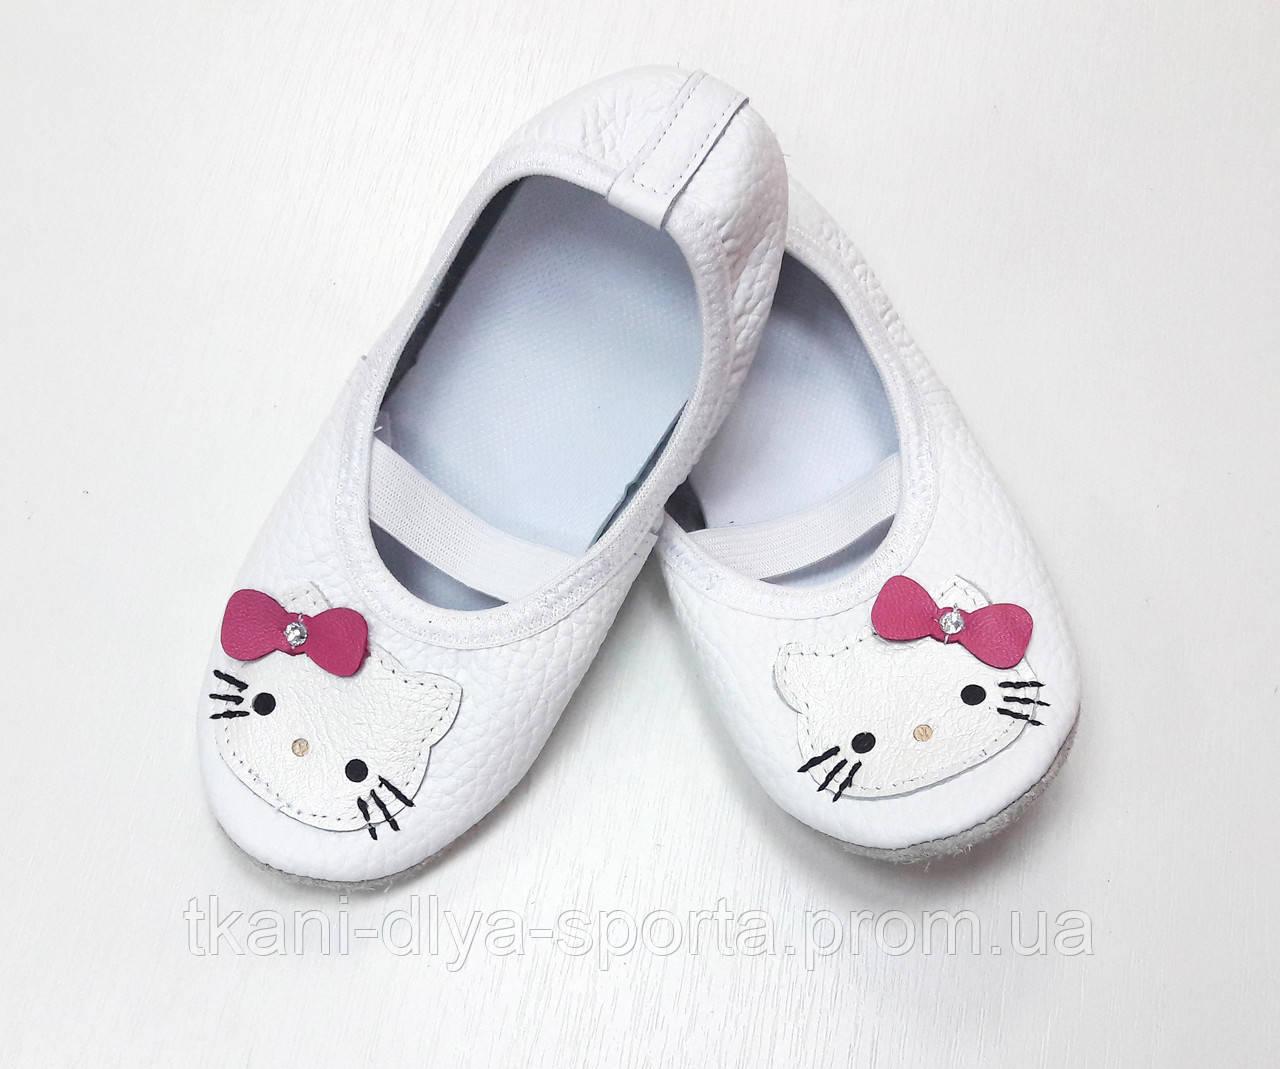 Чешки белые кожаные с аппликацией Hello Kitty